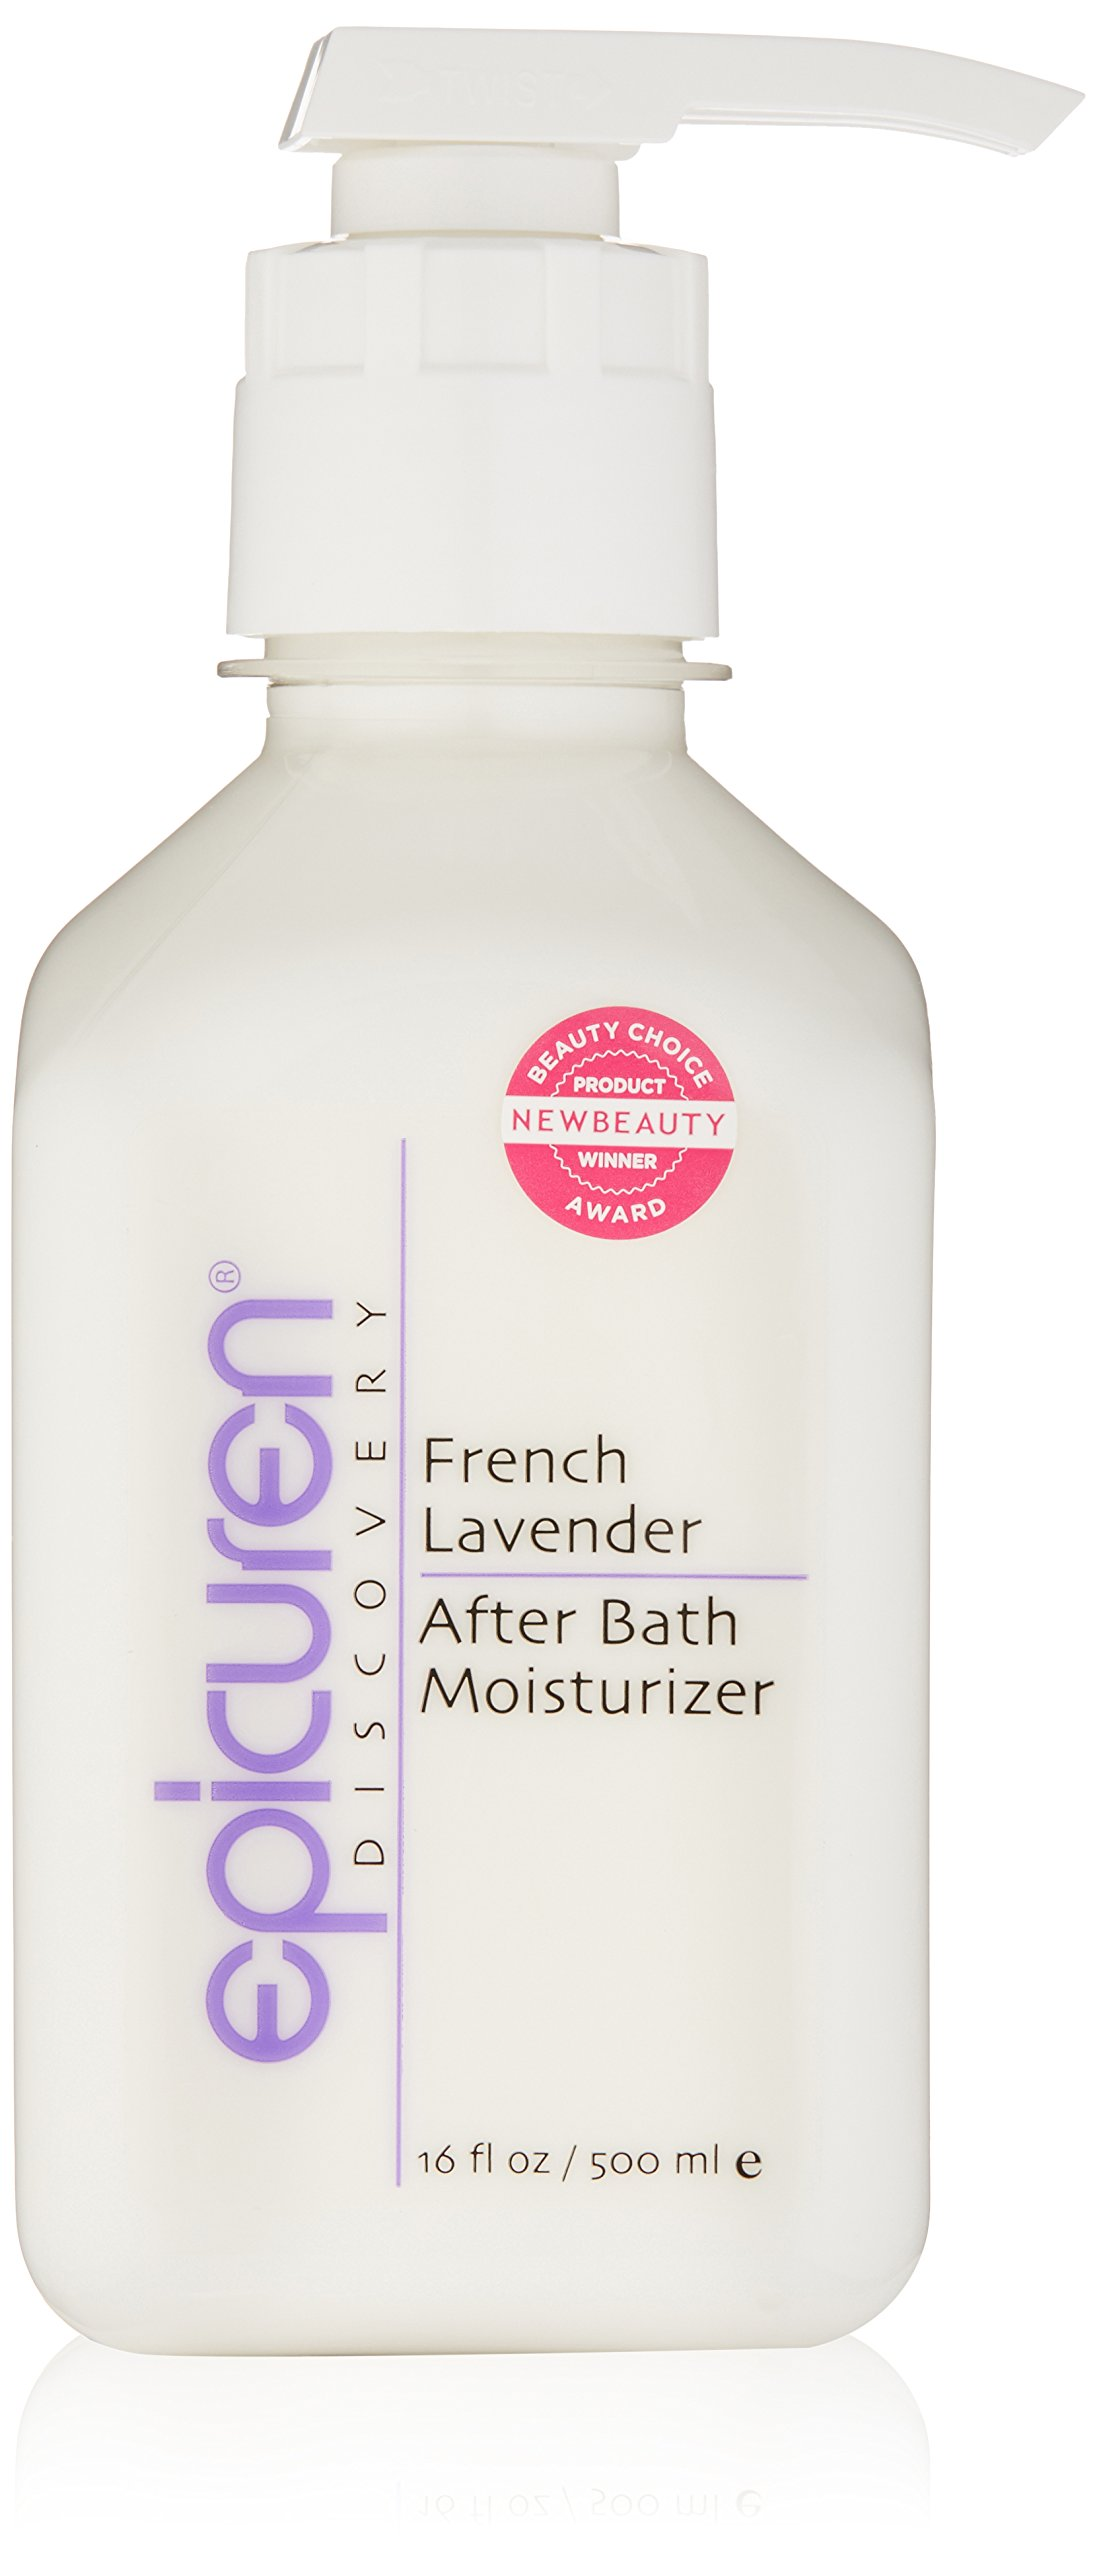 Epicuren Discovery French Lavender After Bath Body Moisturizer, 16 Fl oz